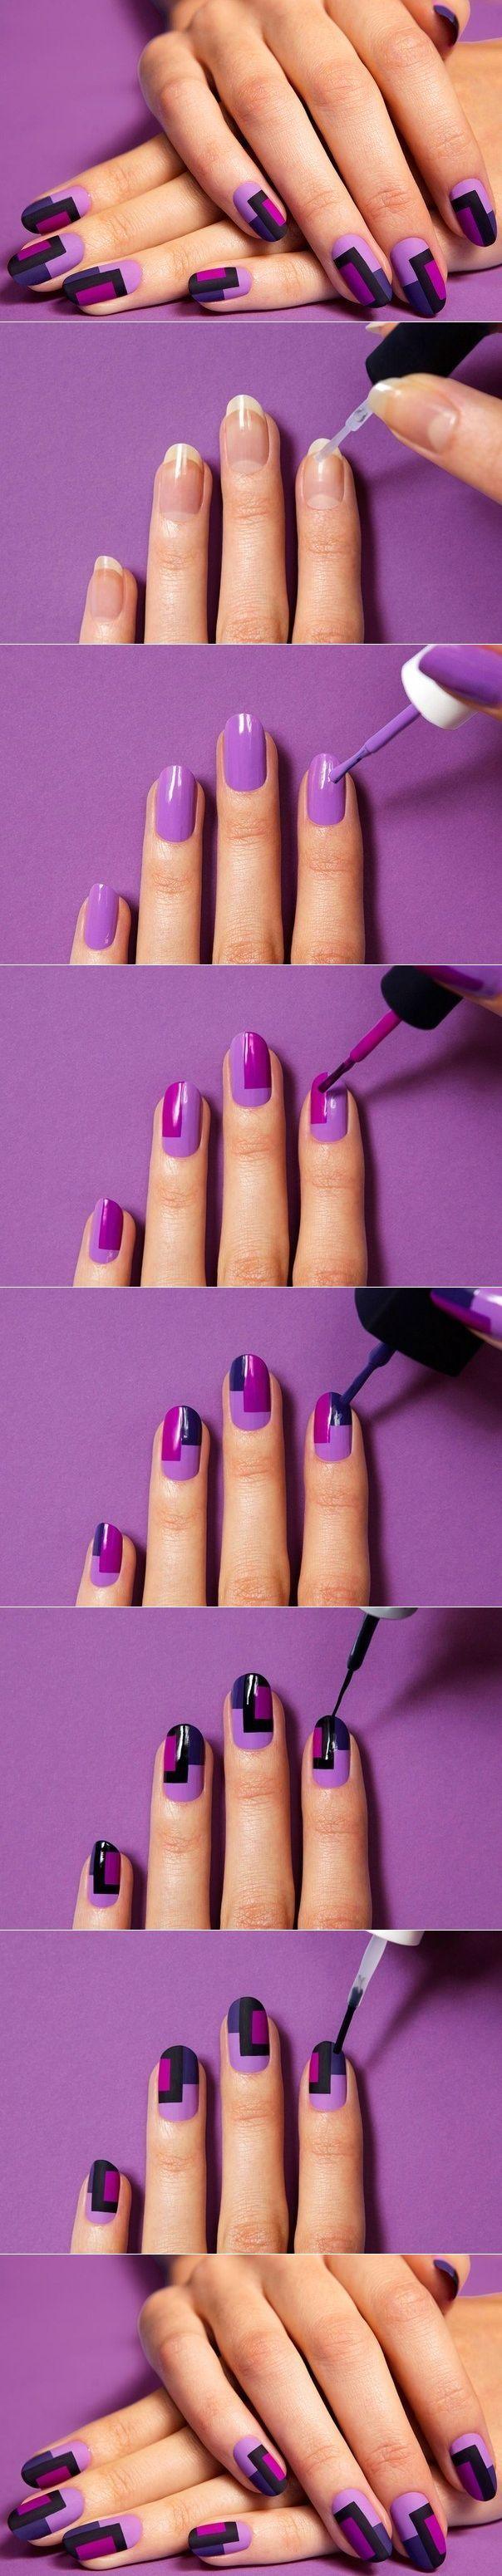 block nail painting tutorial